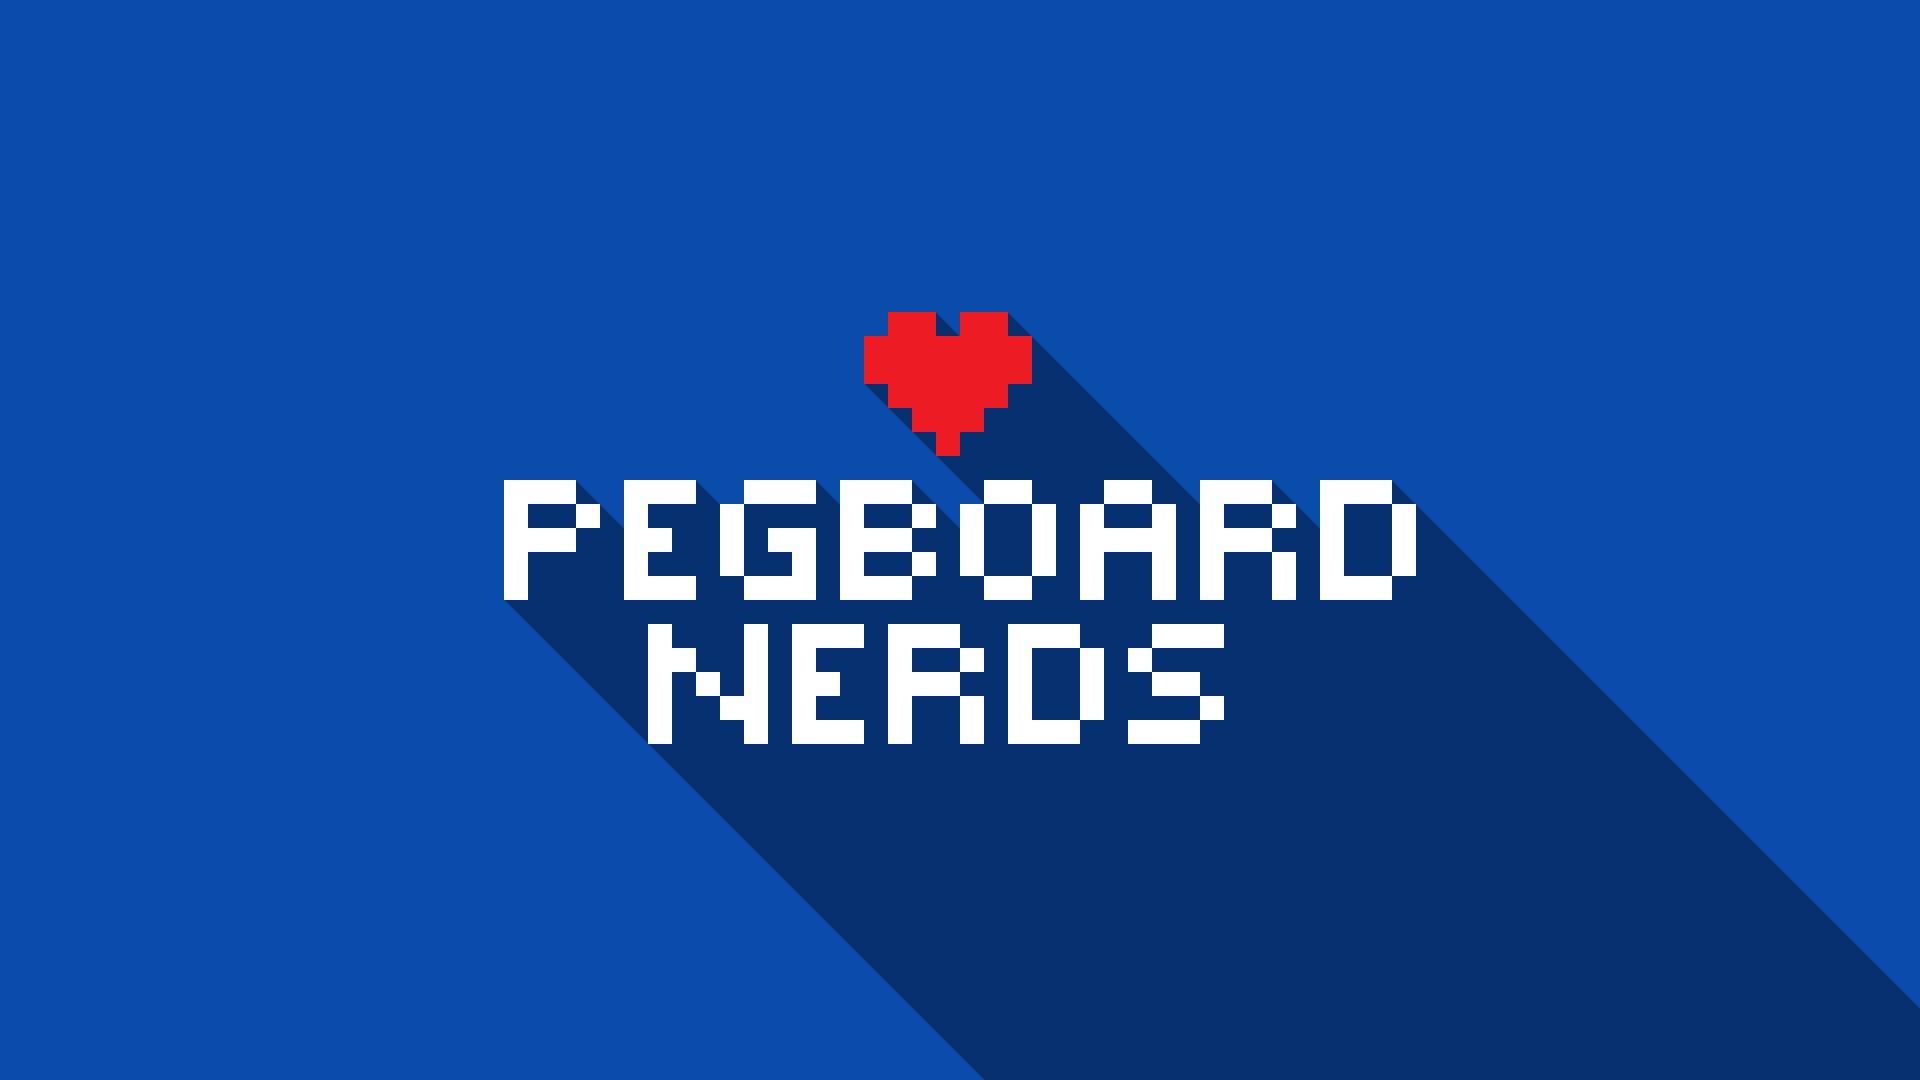 Computer Pegboard Nerds Wallpapers, Desktop Backgrounds 1920×1080